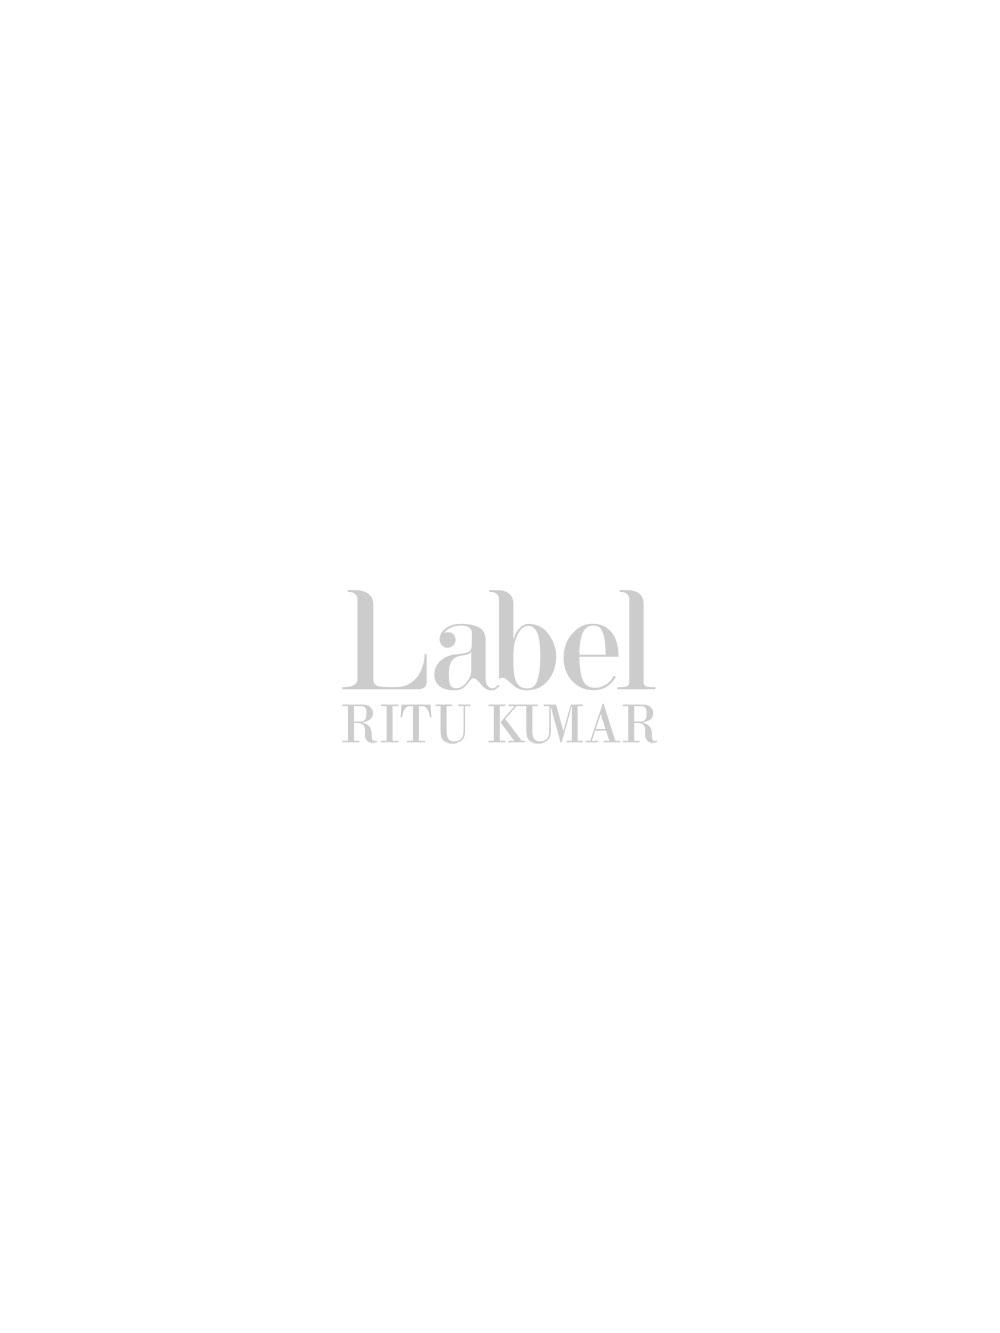 Designer Handbag Sale by Label Ritu Kumar